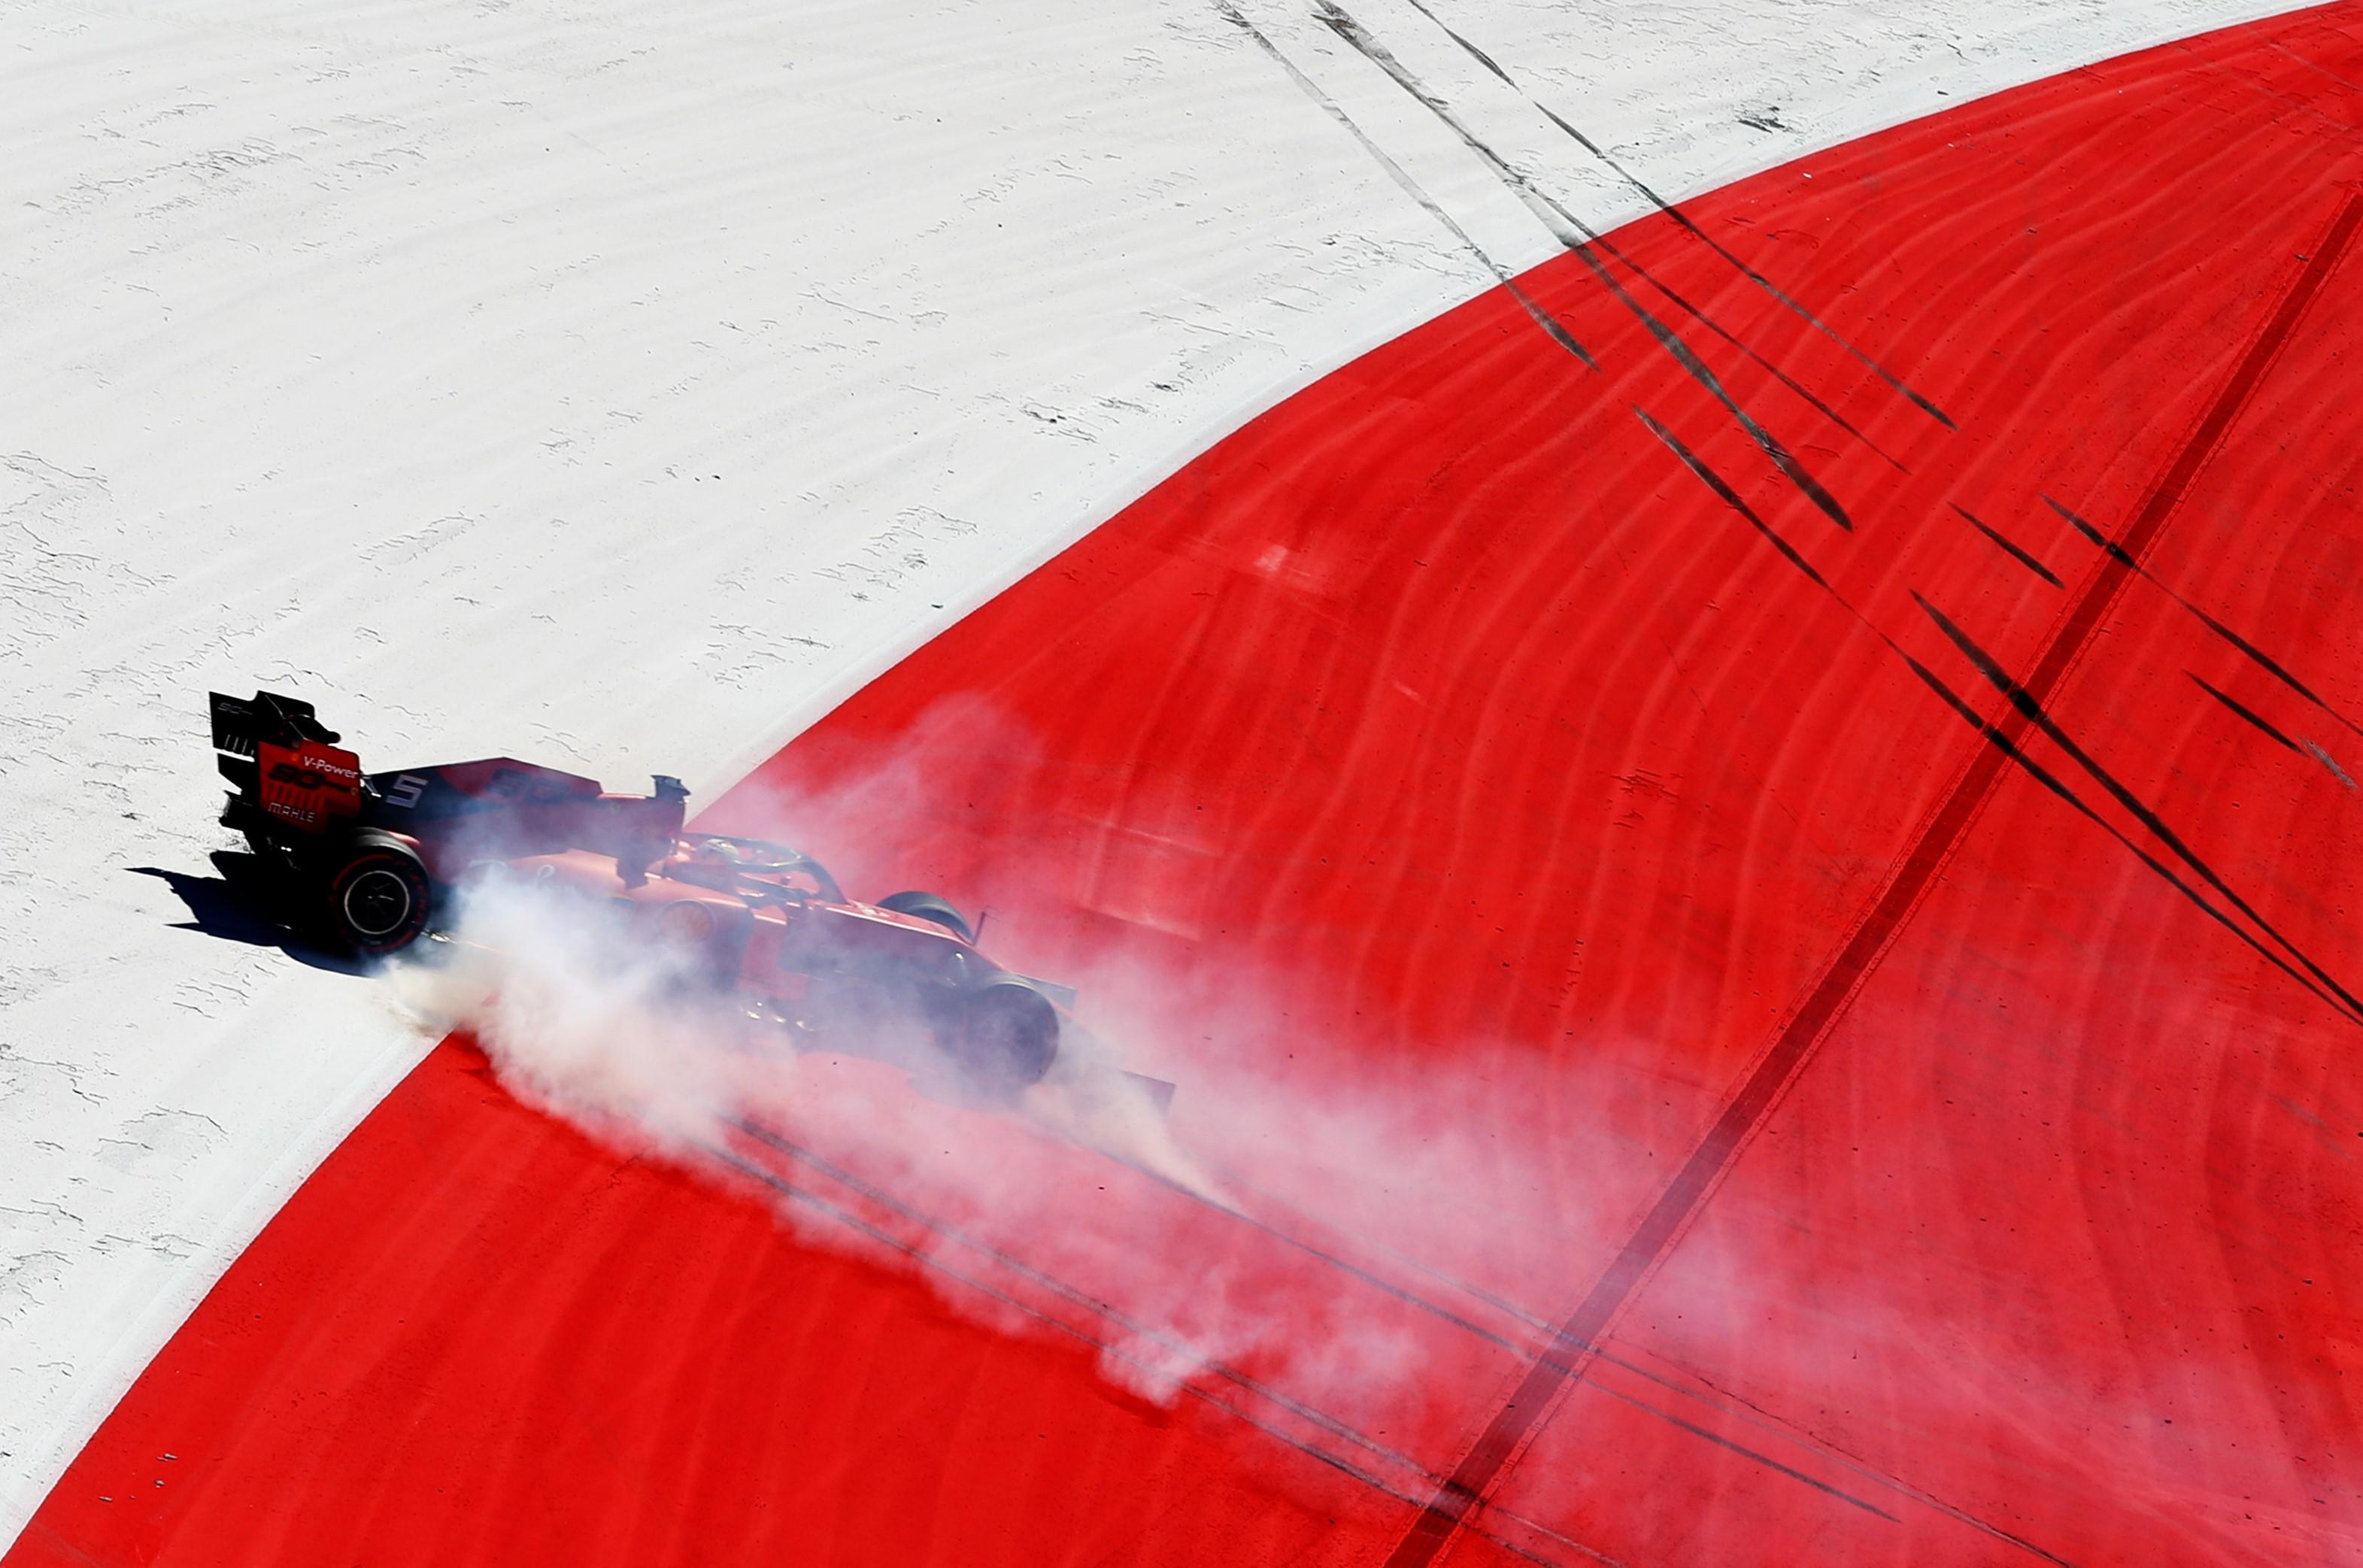 Sebastian Vettel (Ferrari) au Grand Prix d'Autriche 2019